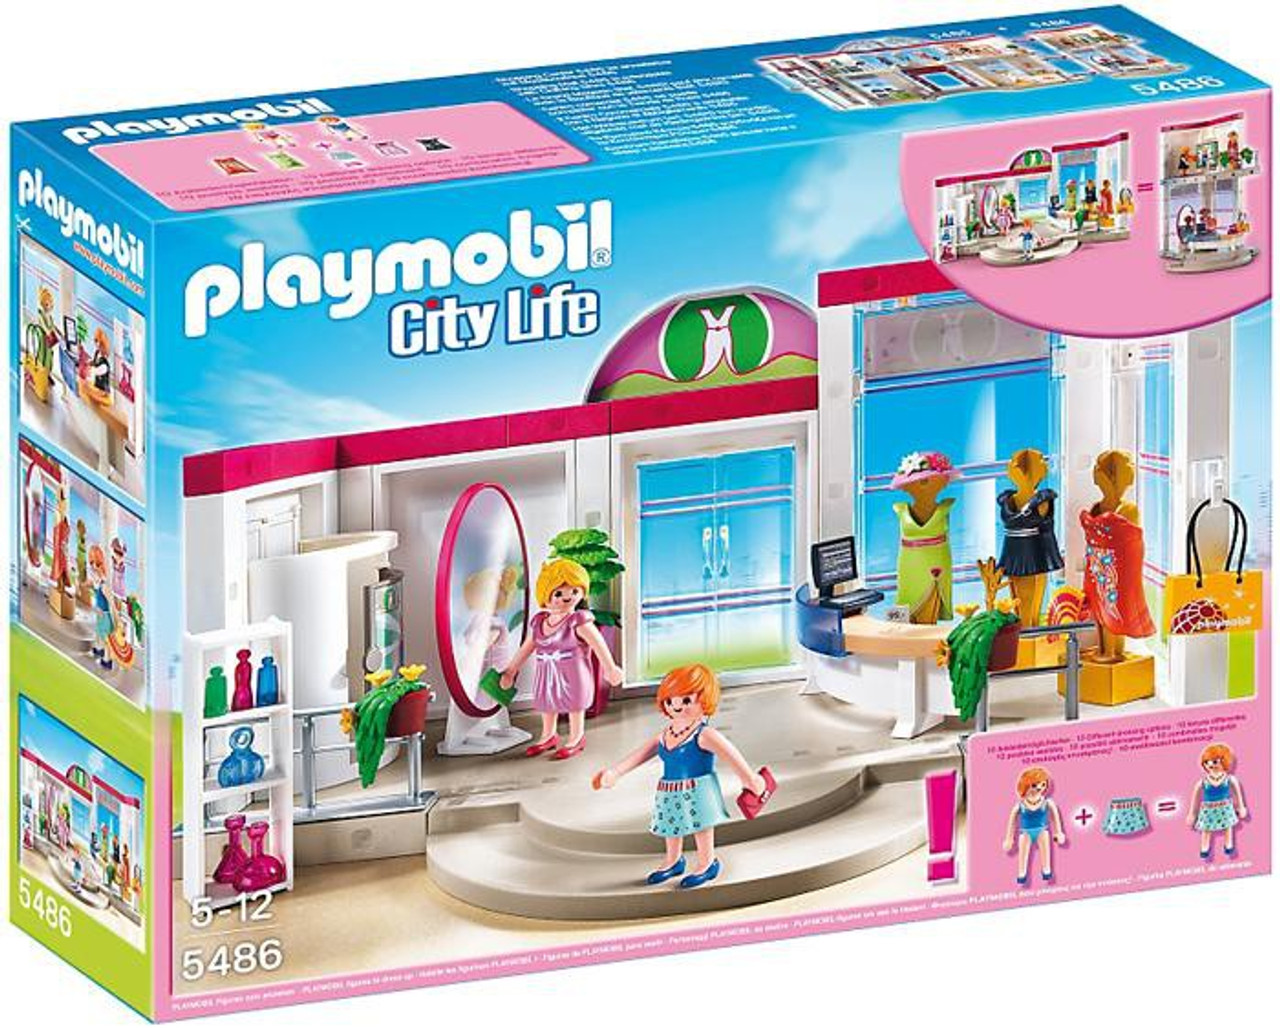 Playmobil City Life Clothing Boutique Set #5486